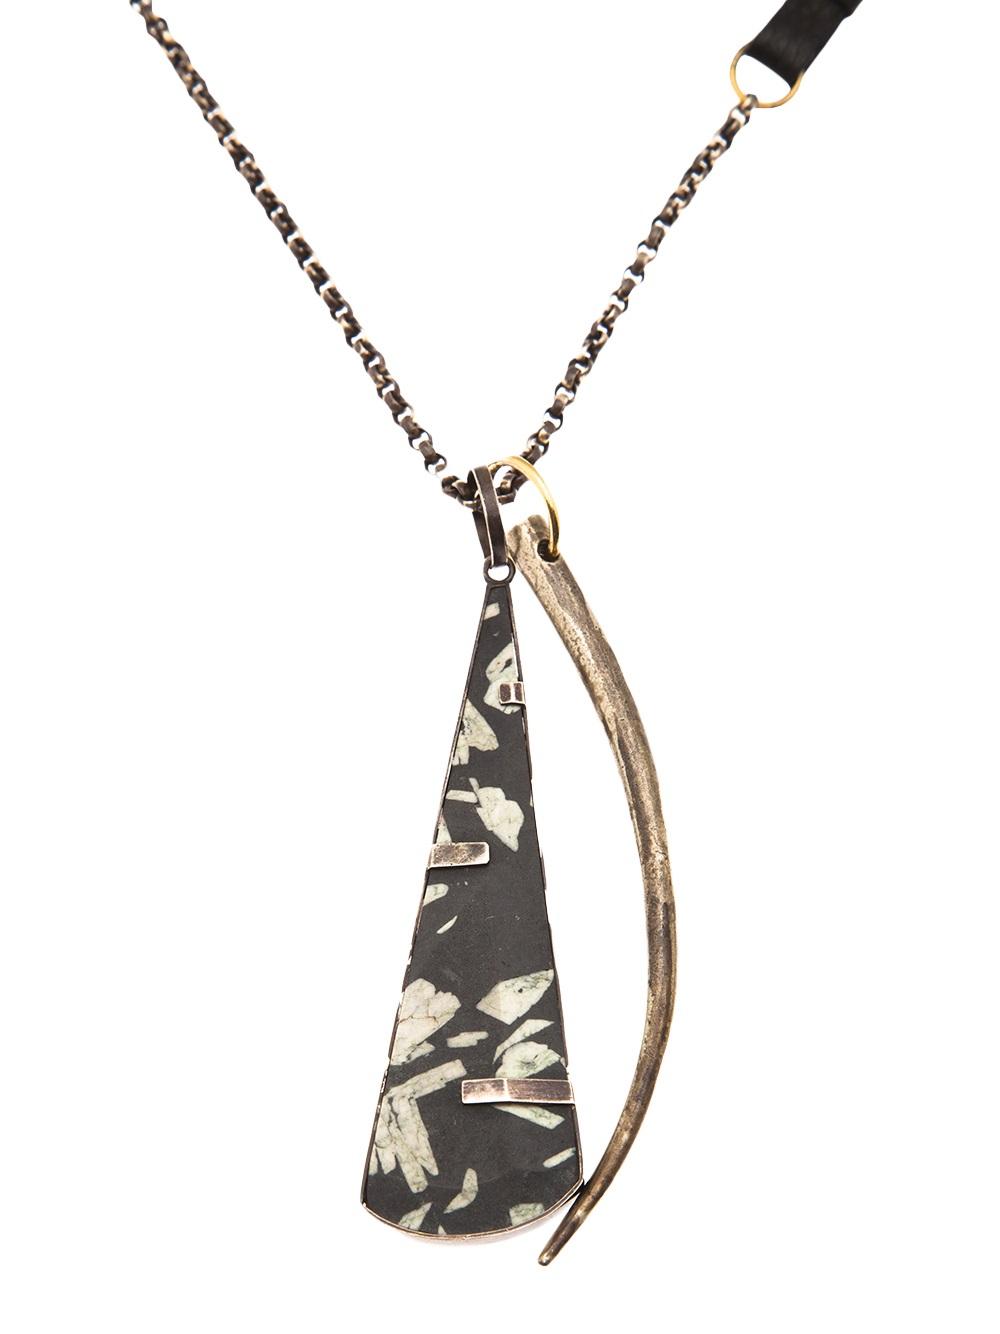 Beth Orduna Chinese Writing Stone Necklace in Metallic